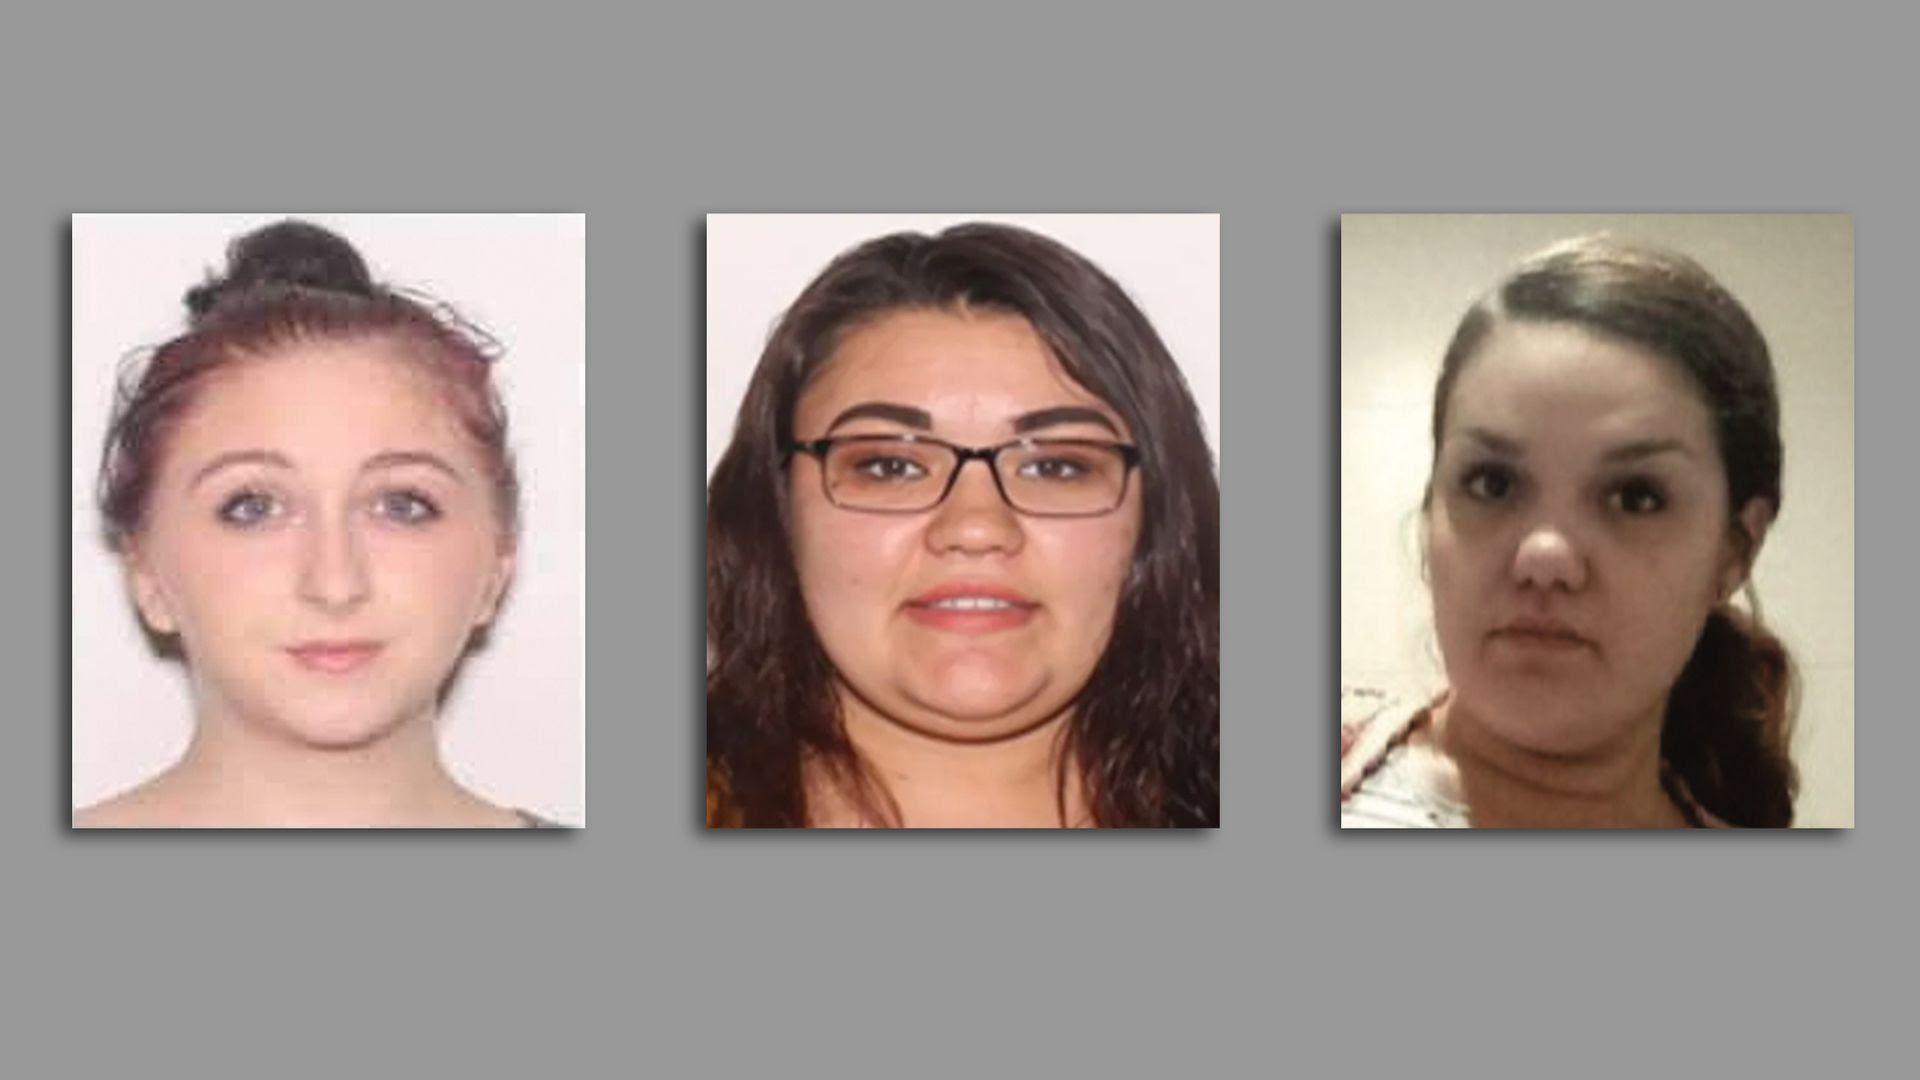 Portraits of Kelly Vazquez, Veronica Reyes-Diaz and Cieha Taylor.